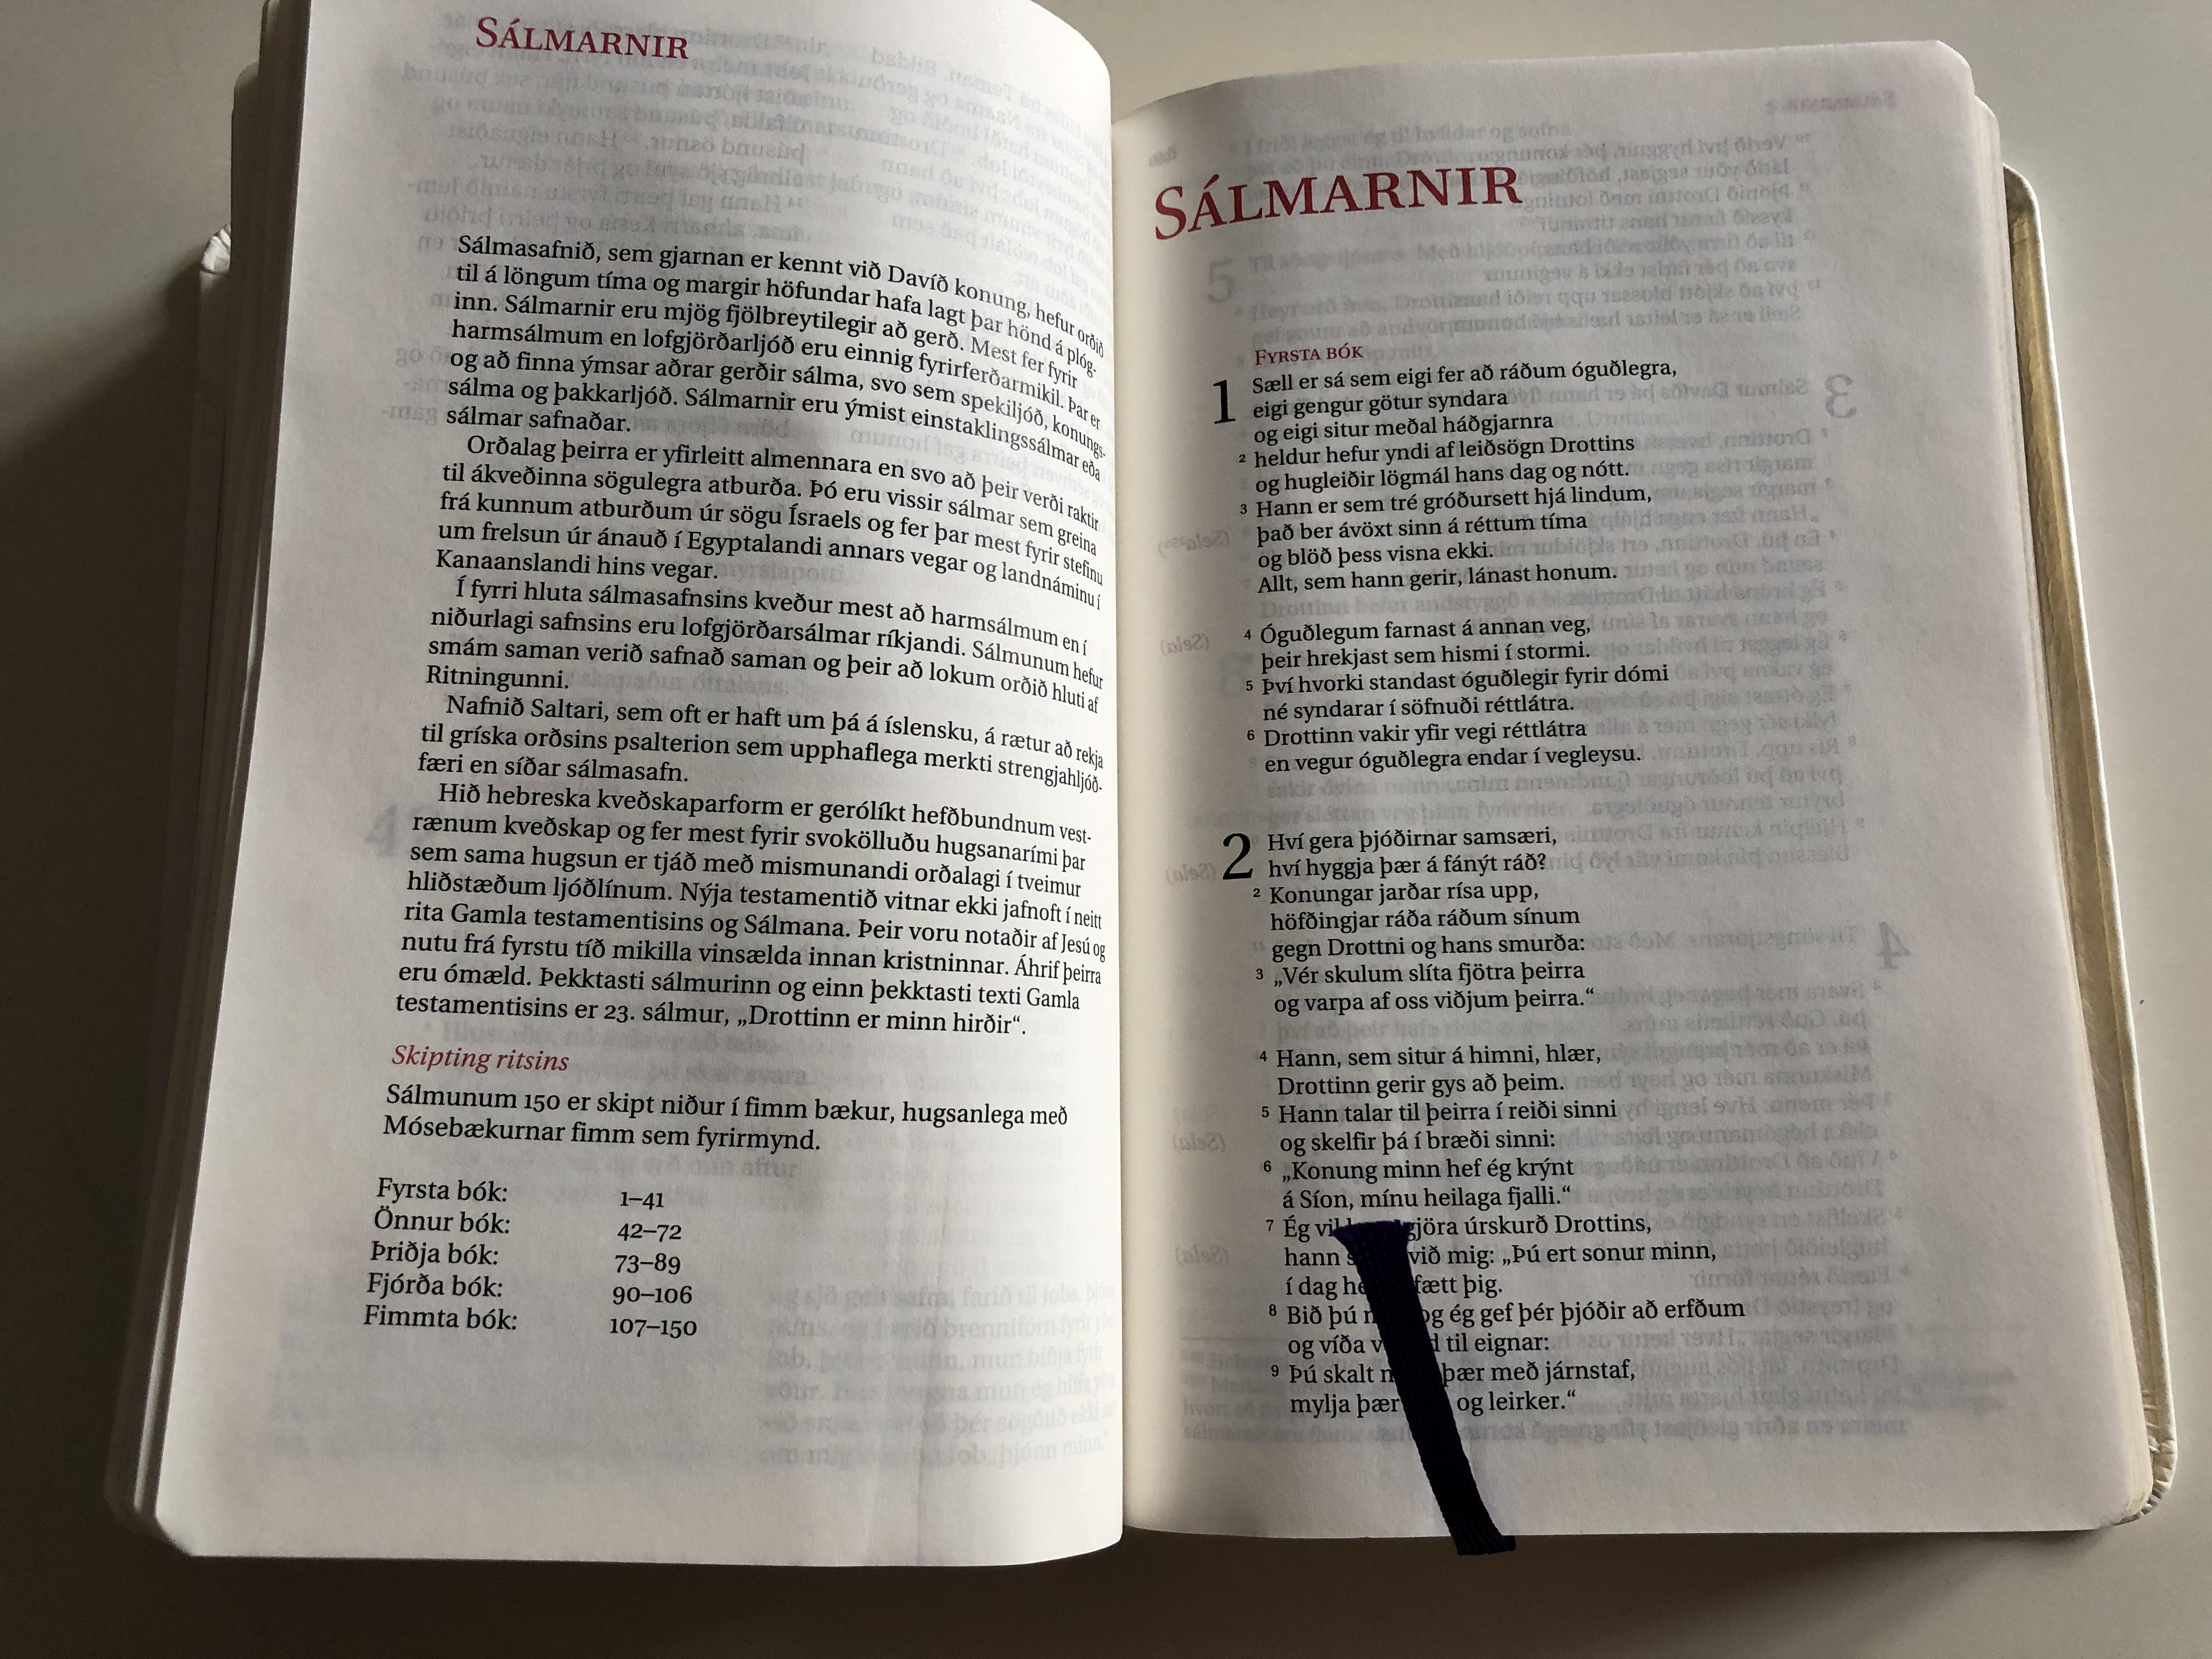 icelandic-catholic-bible-bibl-an-gamla-testamenti-samt-ap-kr-fu-b-kunum-n-ja-testamenti-14.jpg